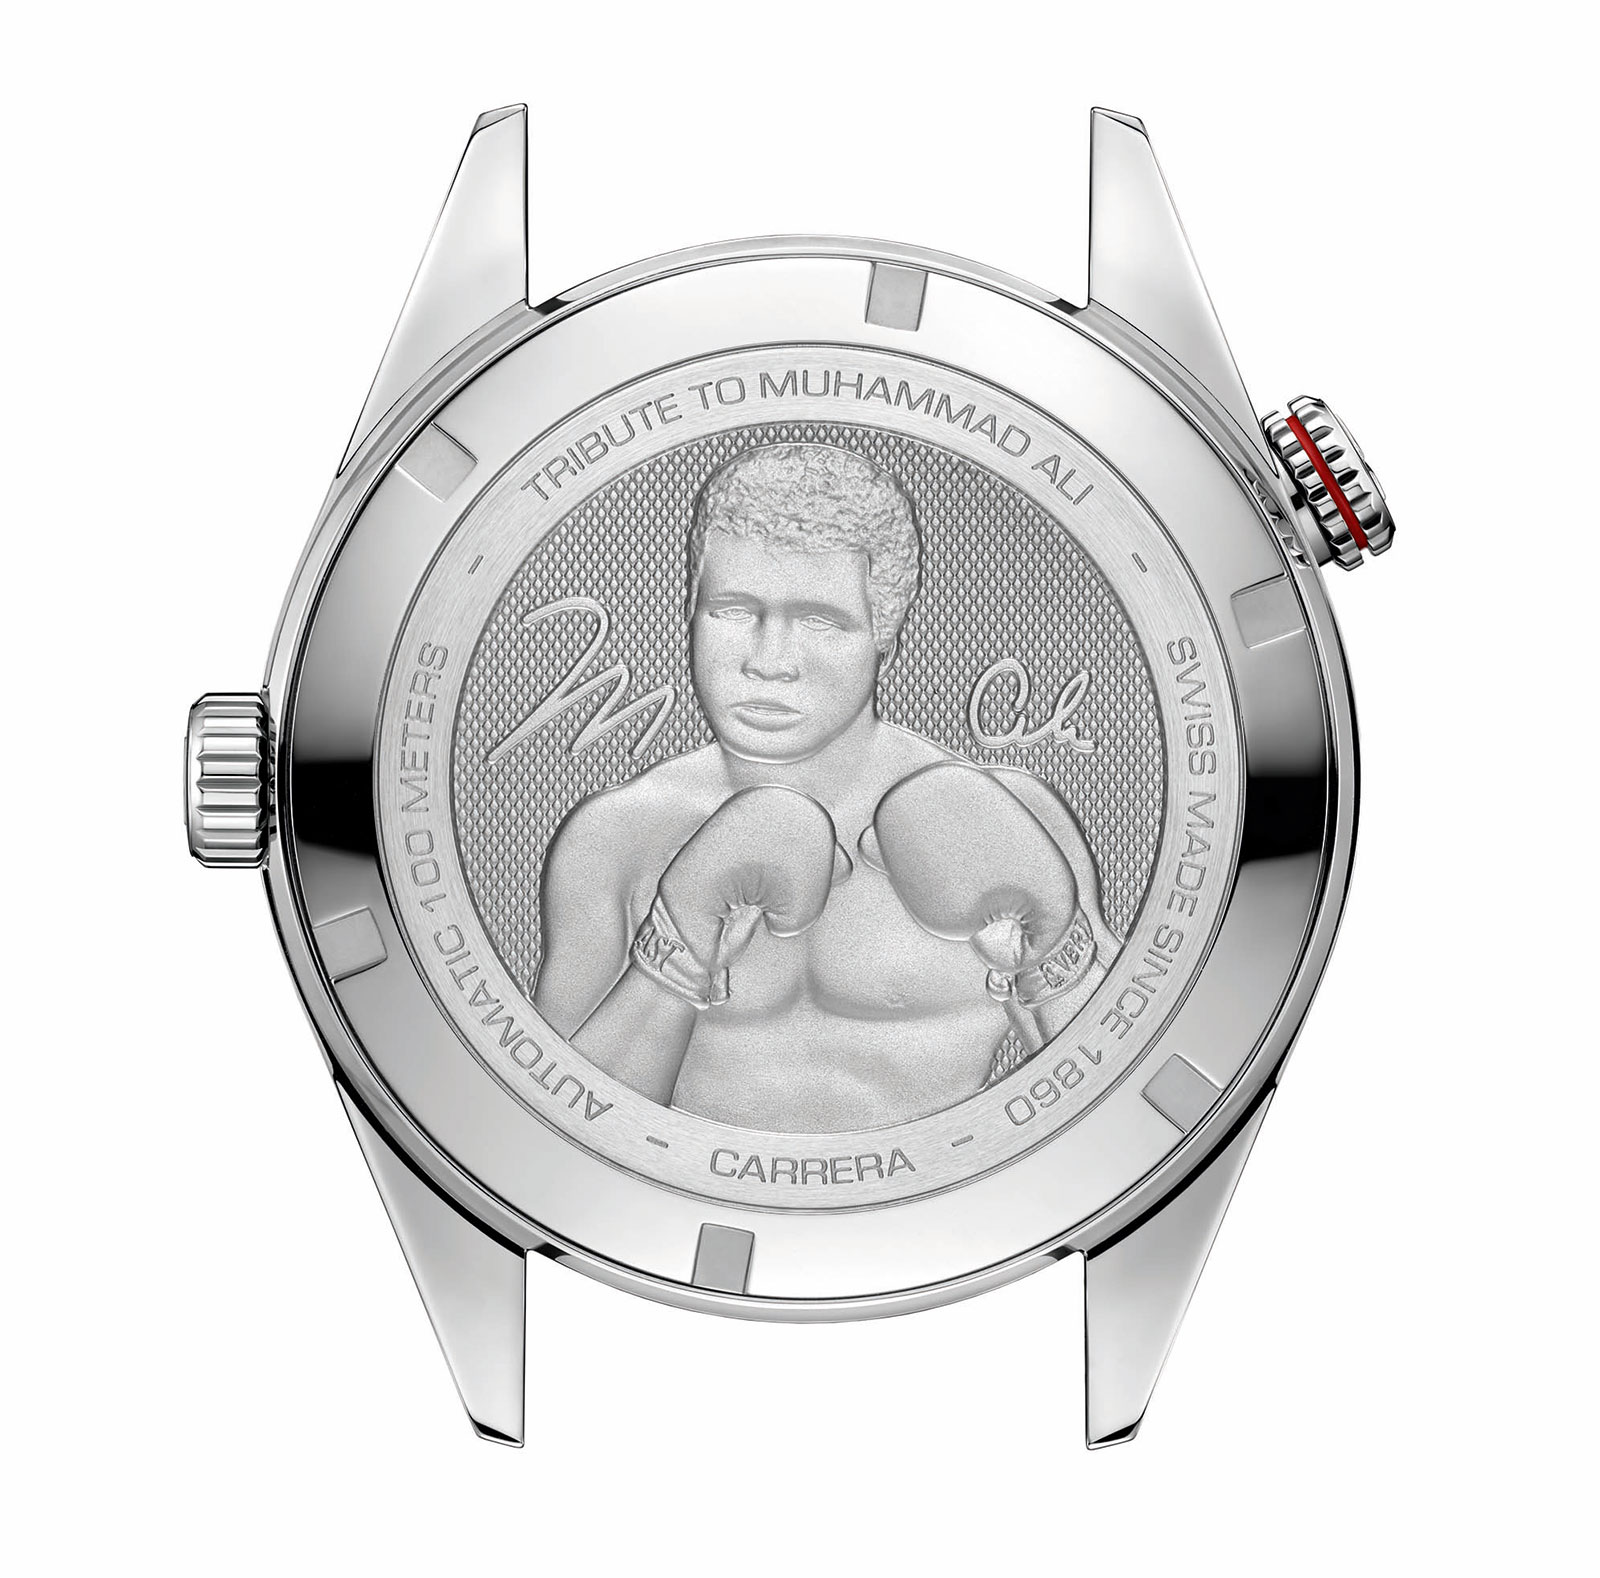 TAG Heuer Carrera Ring Master Calibre 5 Muhammad Ali 2